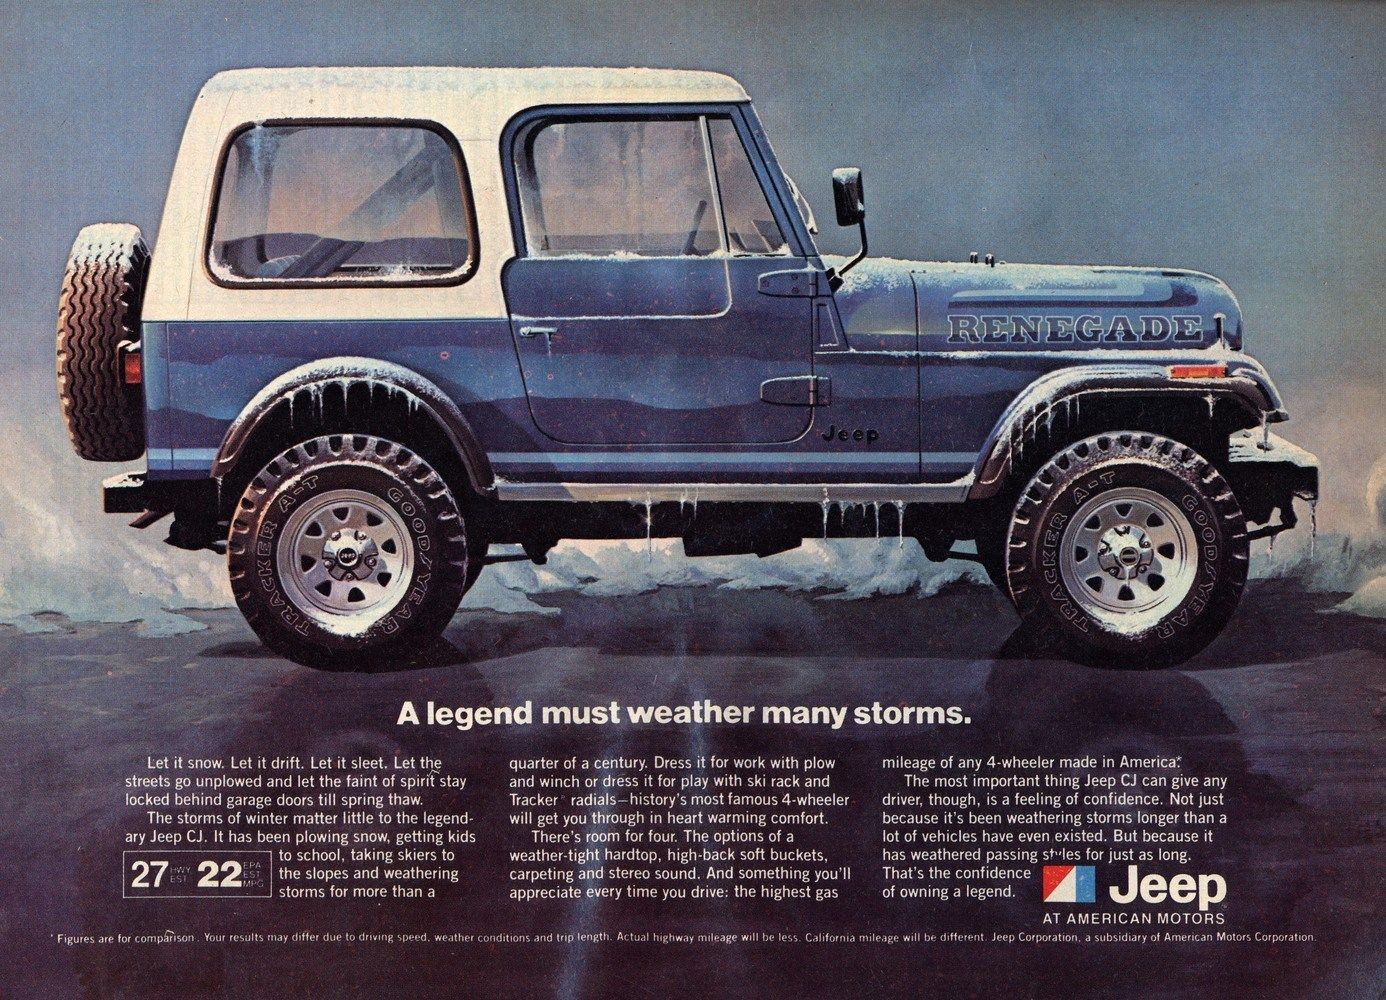 Jeep Renegade Wallpaper Free Hd Widescreen Jennison Gill 2017 03 20